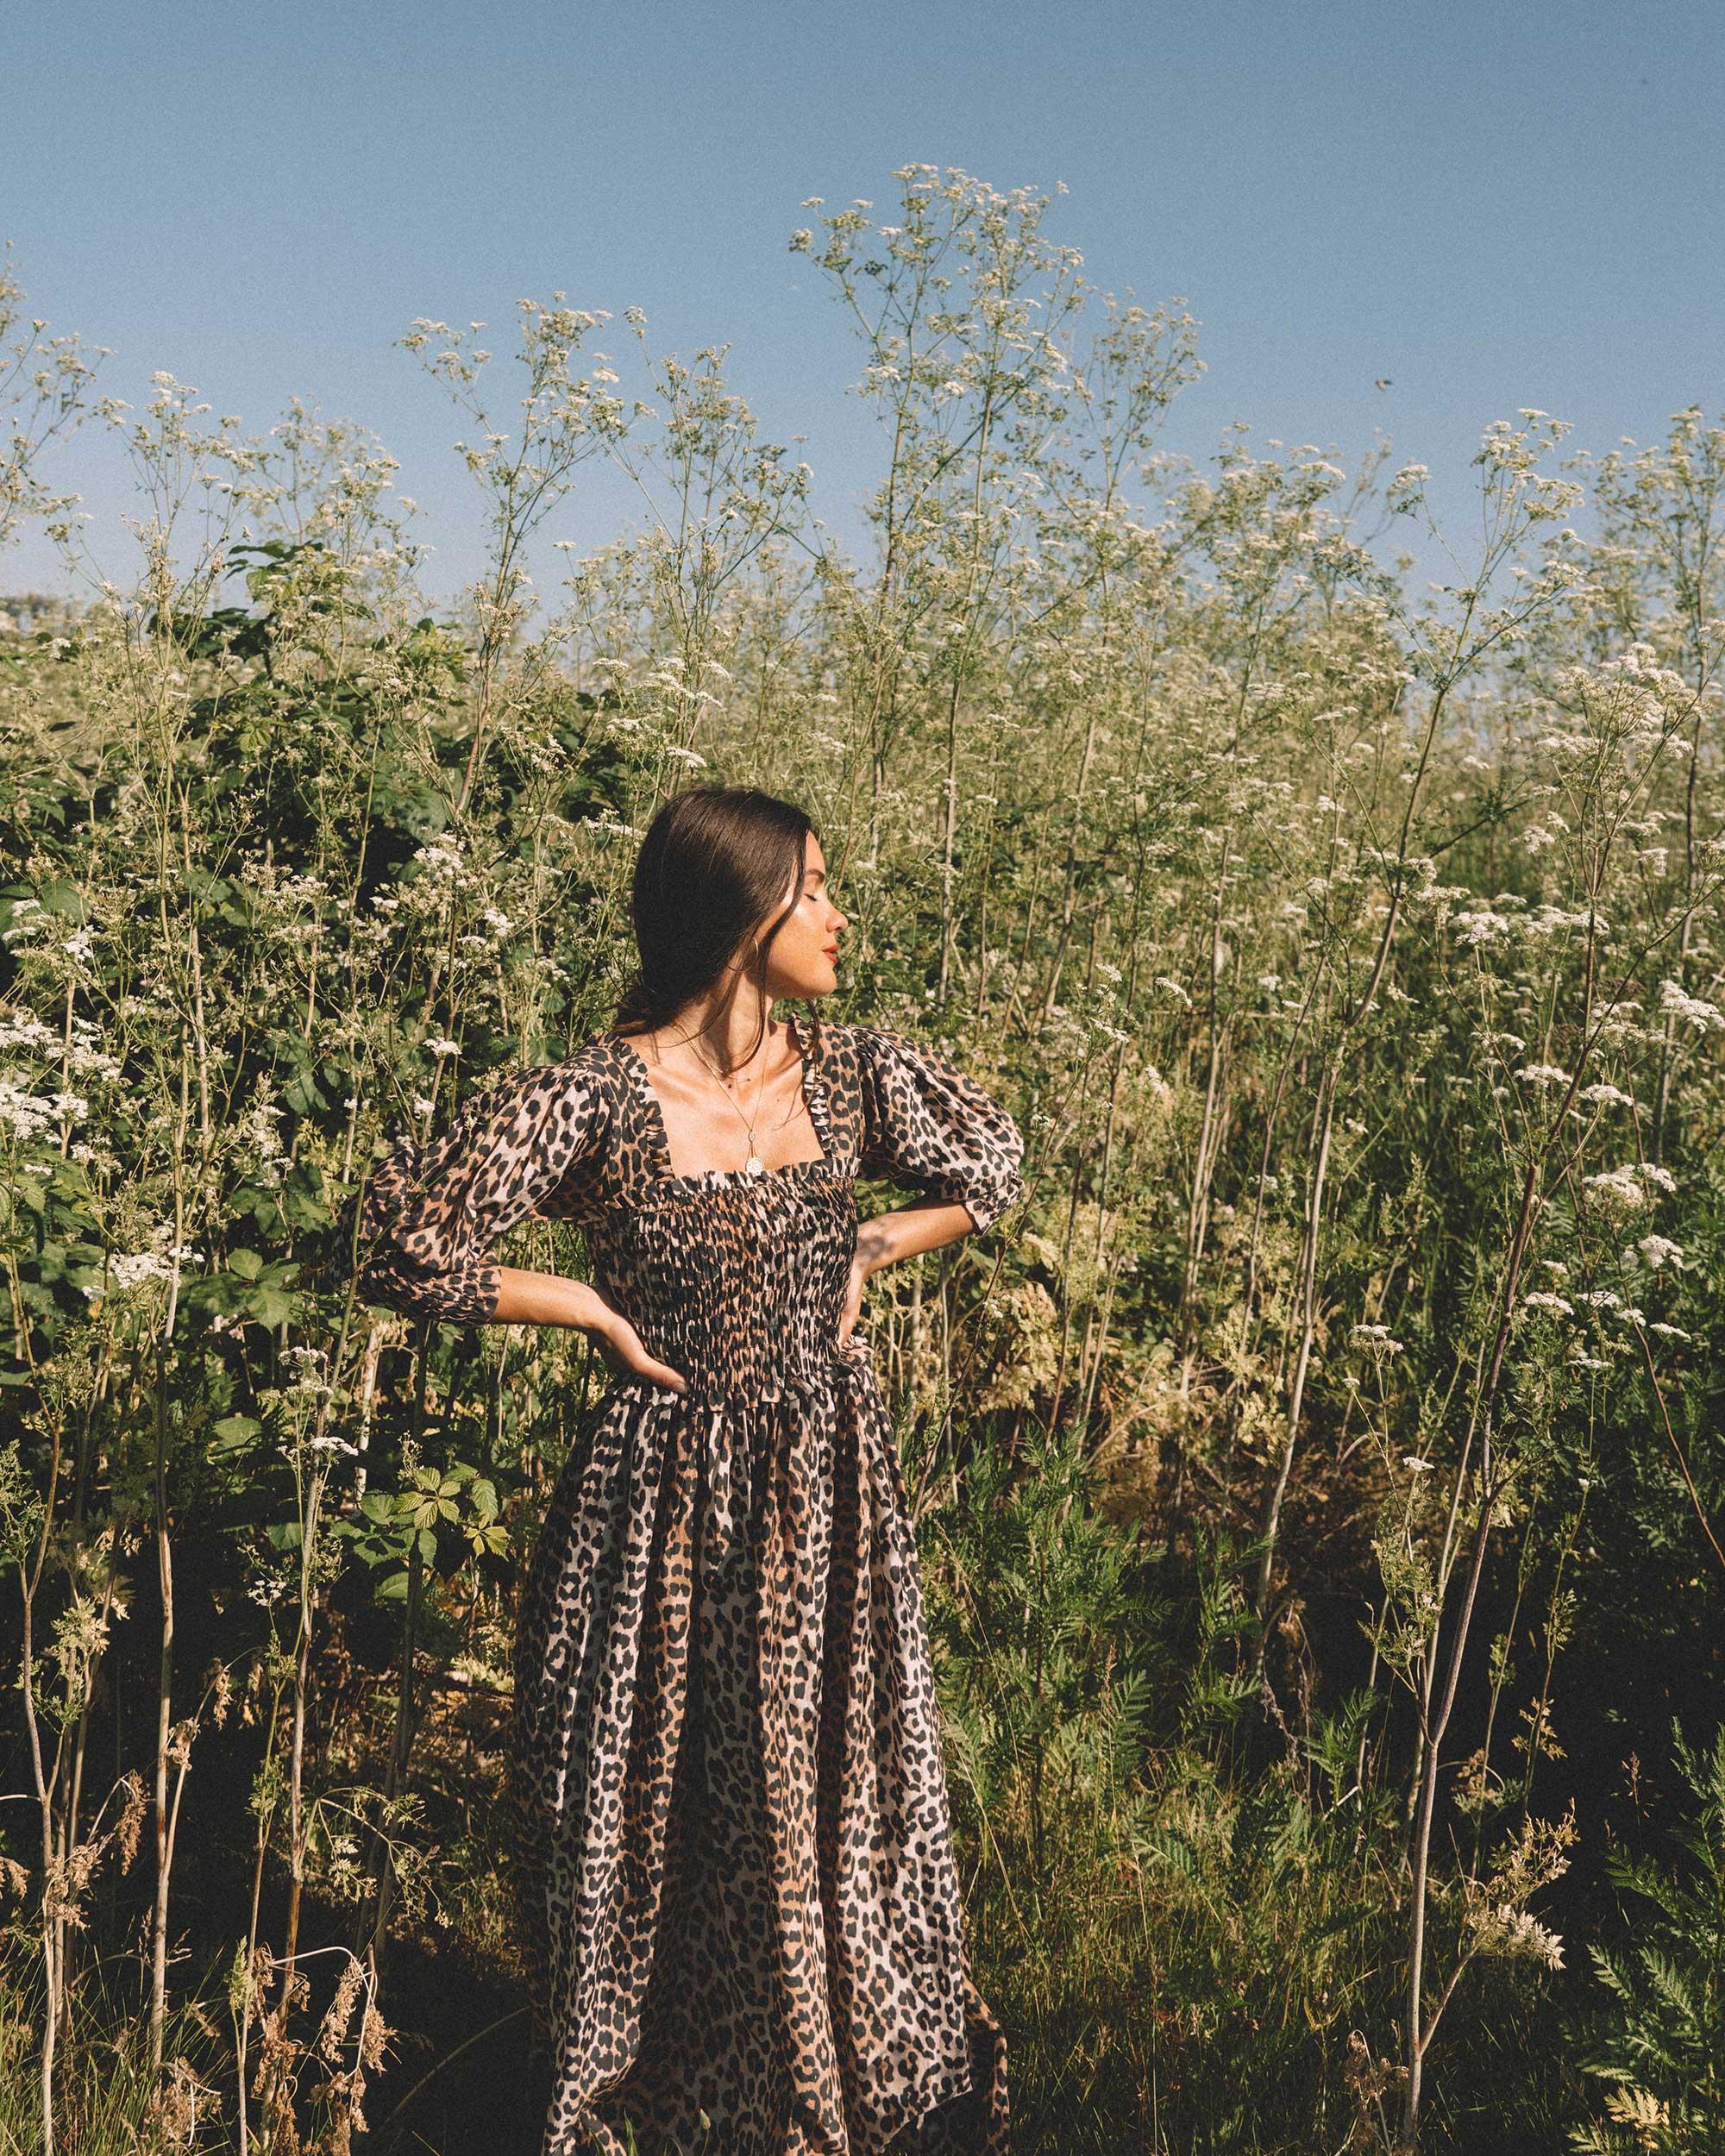 Sarah Butler of Sarah Styles wears GANNI Leopard-print Maxi Dress and GANNI wide brim hat in Seattle, Washington Feild | @sarahchristine -1.jpg